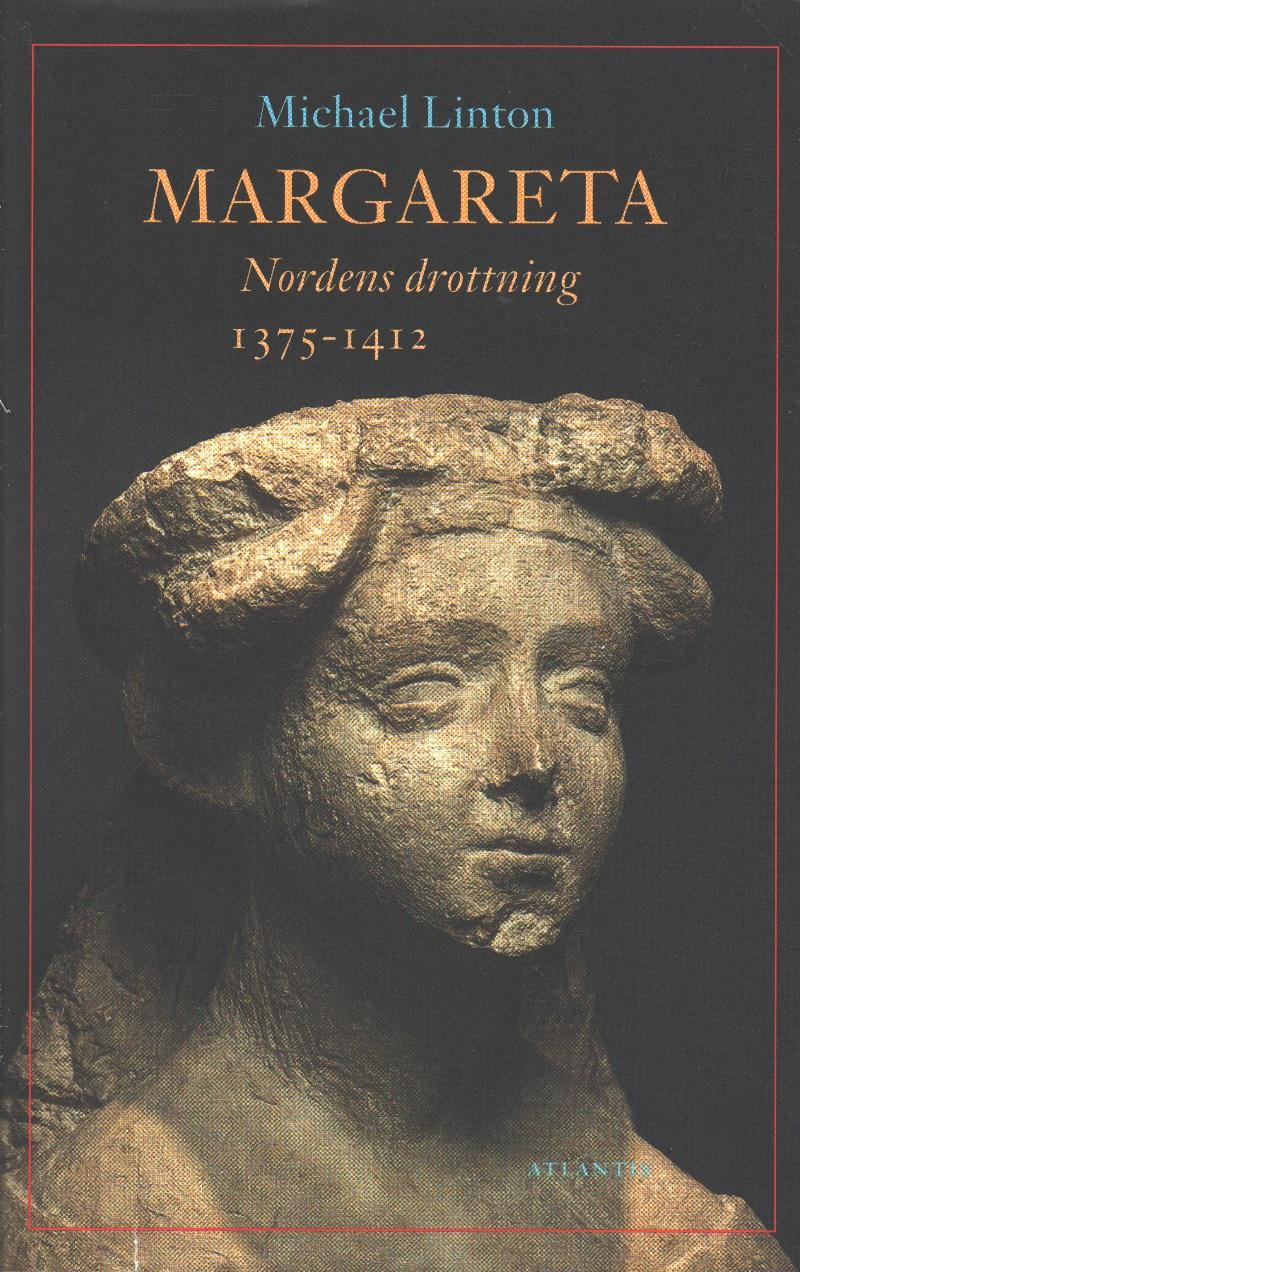 Margareta, Nordens drottning 1375-1412 - Linton, Michael